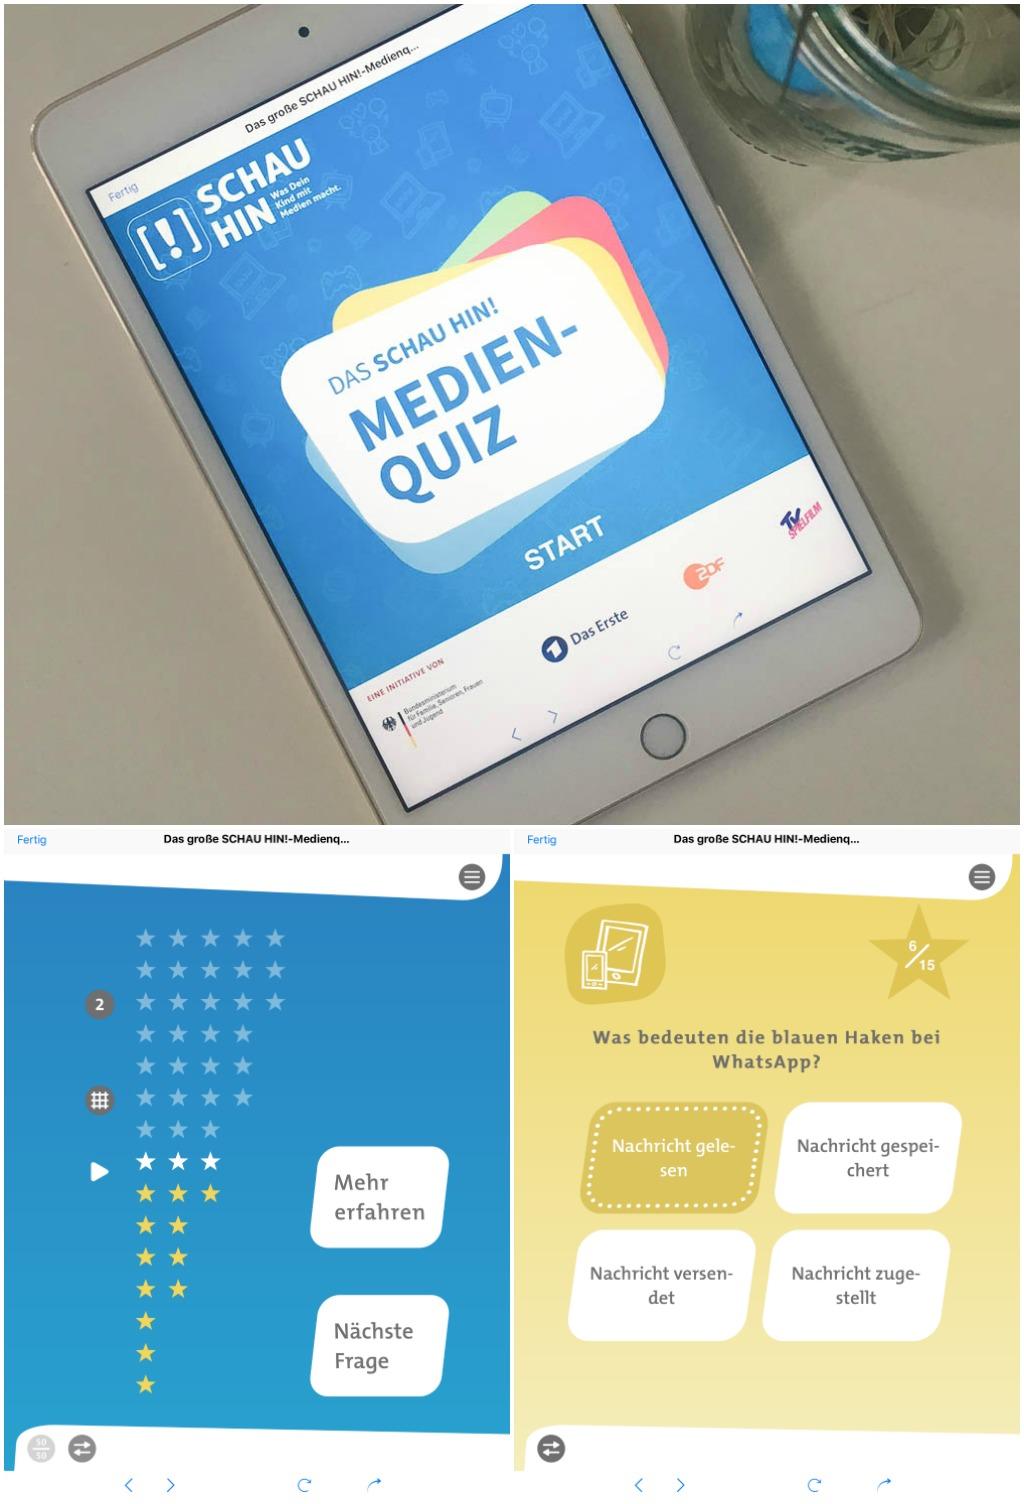 Medienquiz schau hin _gratis Medienguide App Elternratgeber by kleinstyle.com